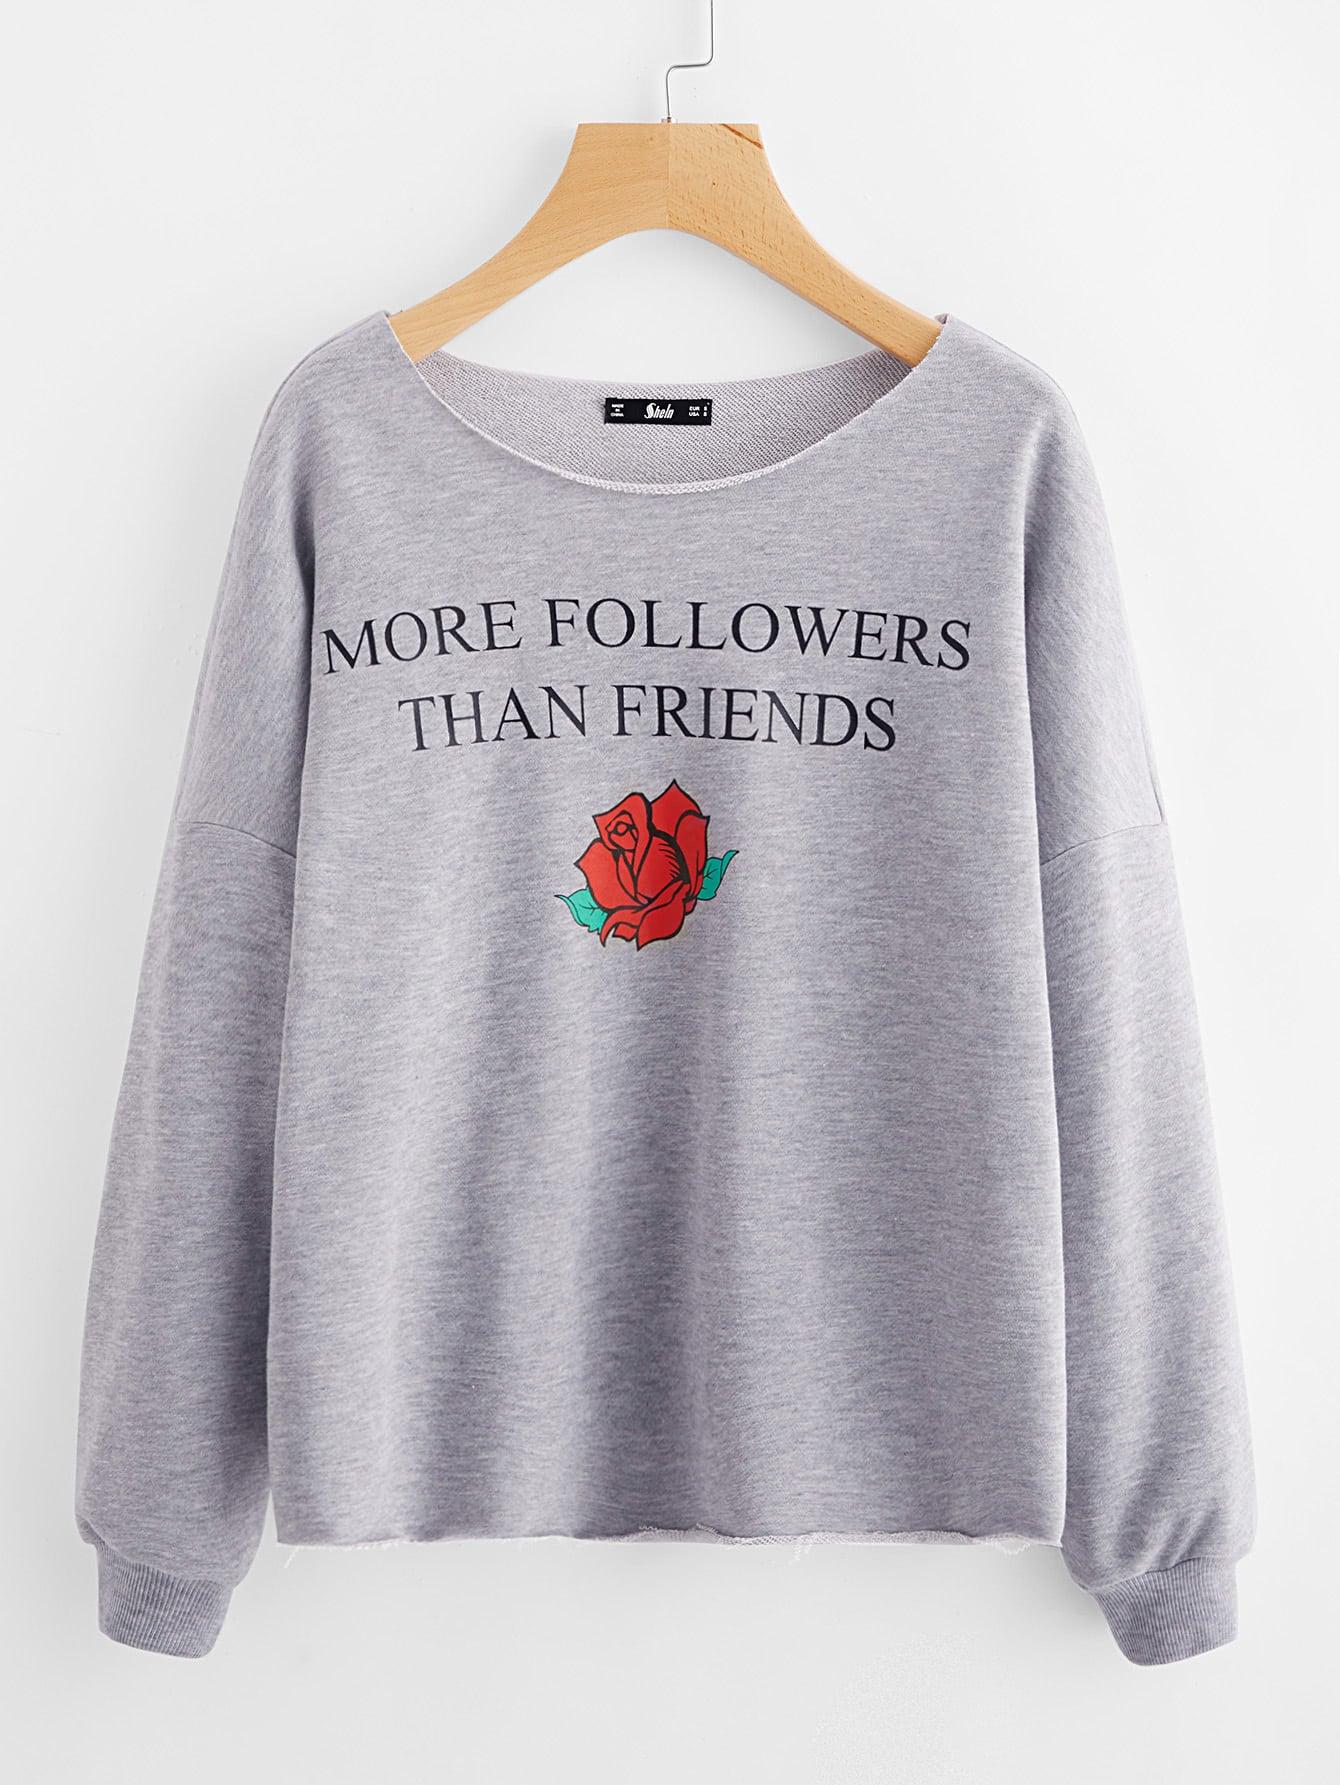 Heather Knit Raw Edge Graphic Sweatshirt raw edge cropped sweatshirt